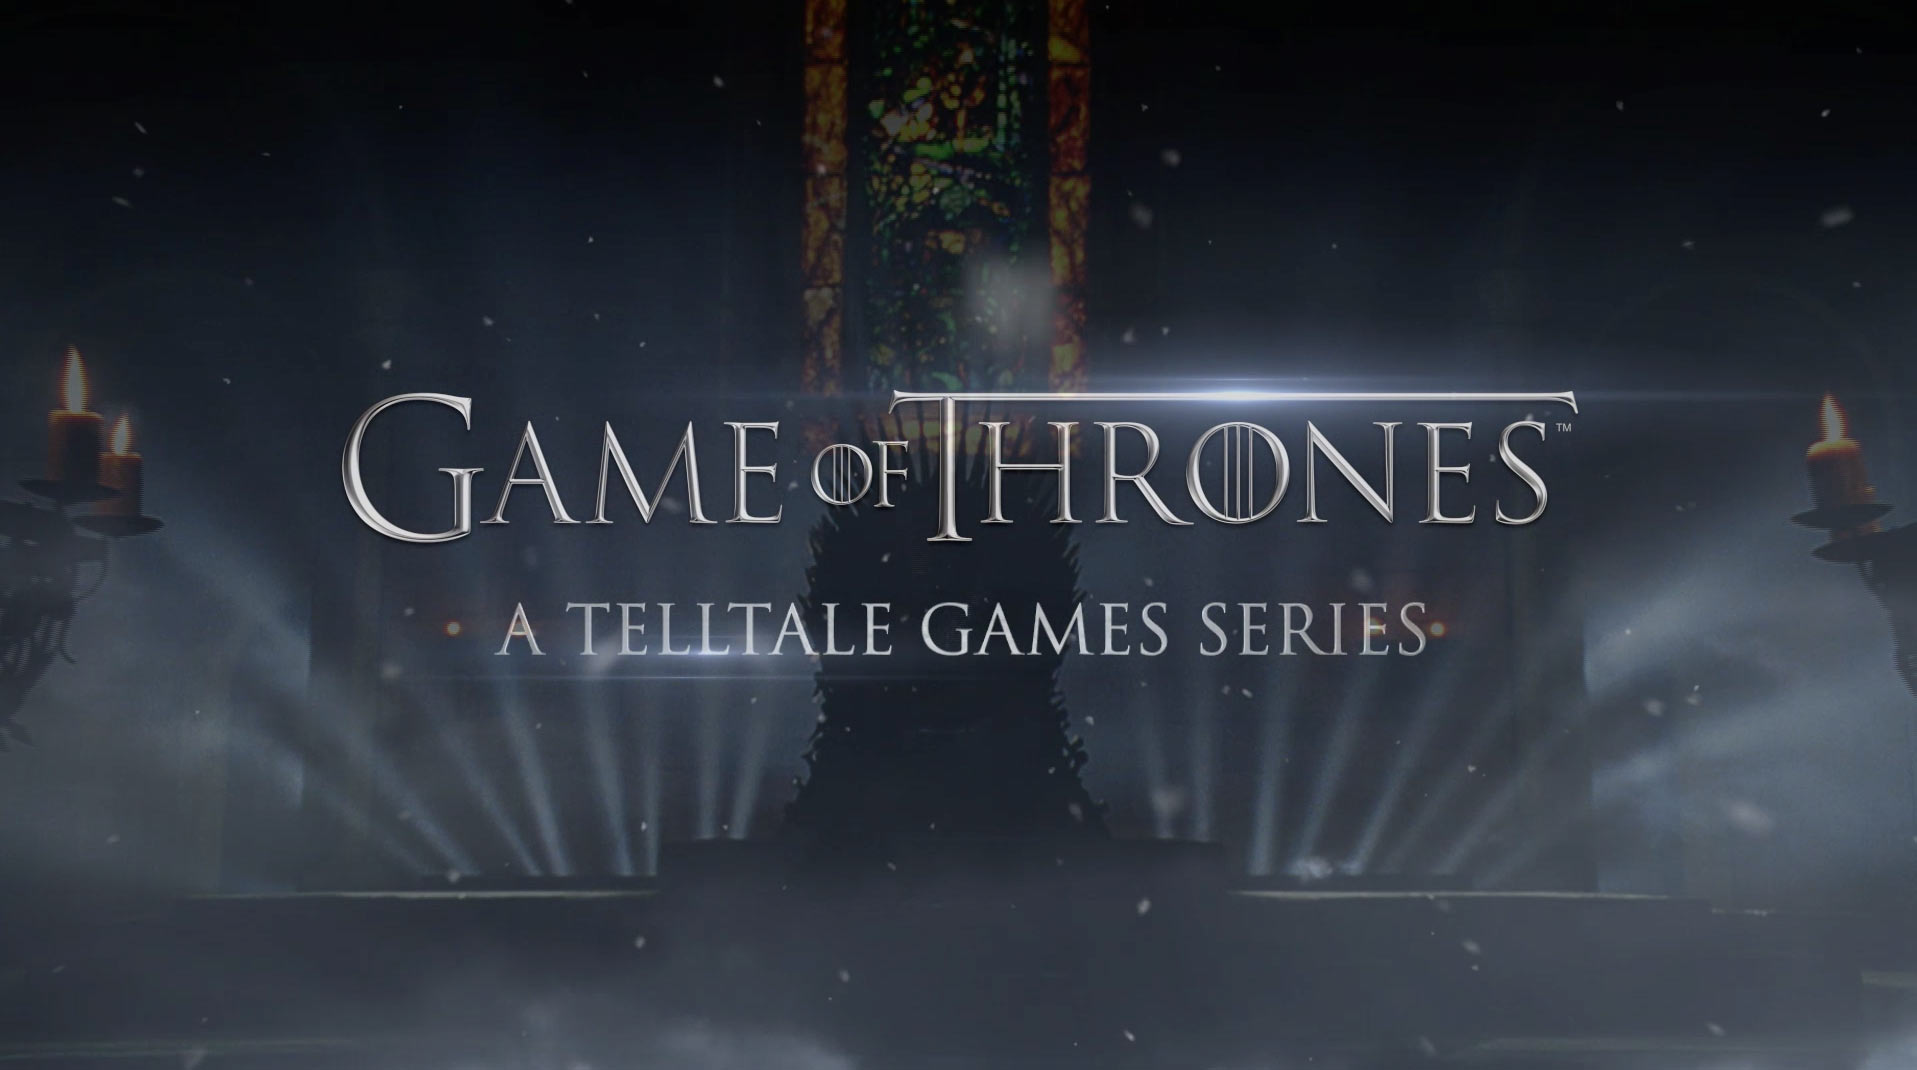 gameofthrones-telltale